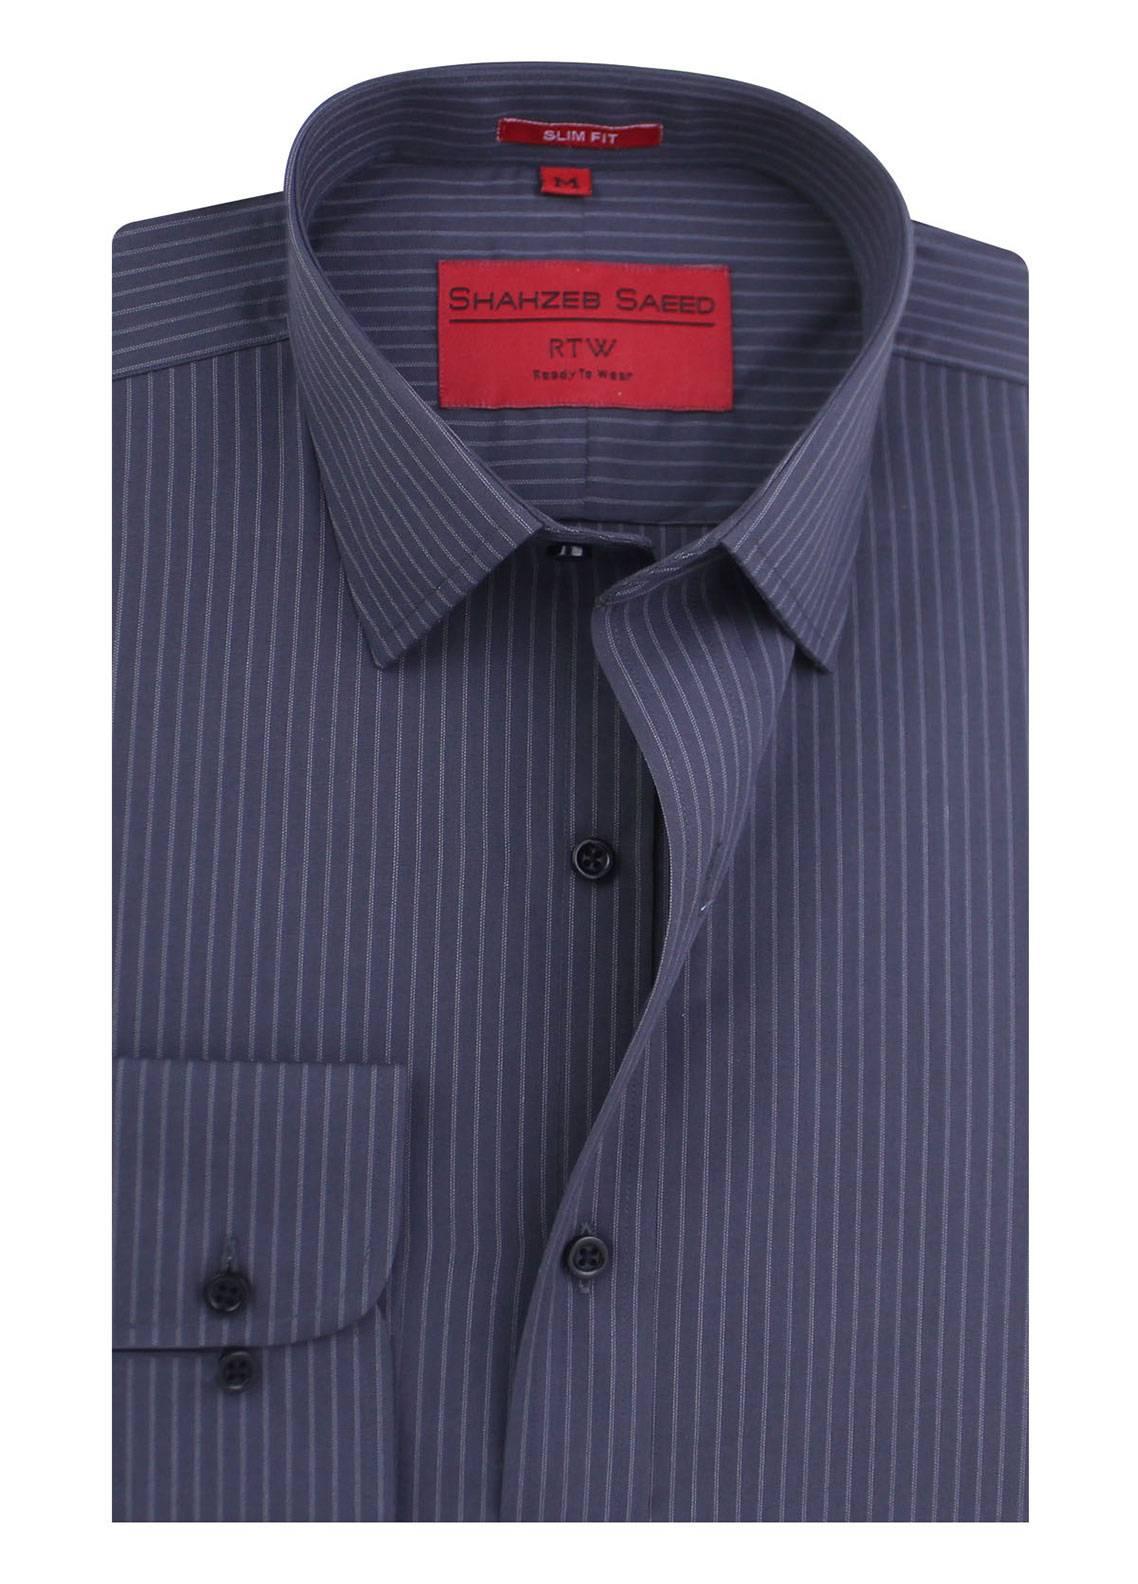 Shahzeb Saeed Cotton Formal Men Shirts - Grey RTW-1341